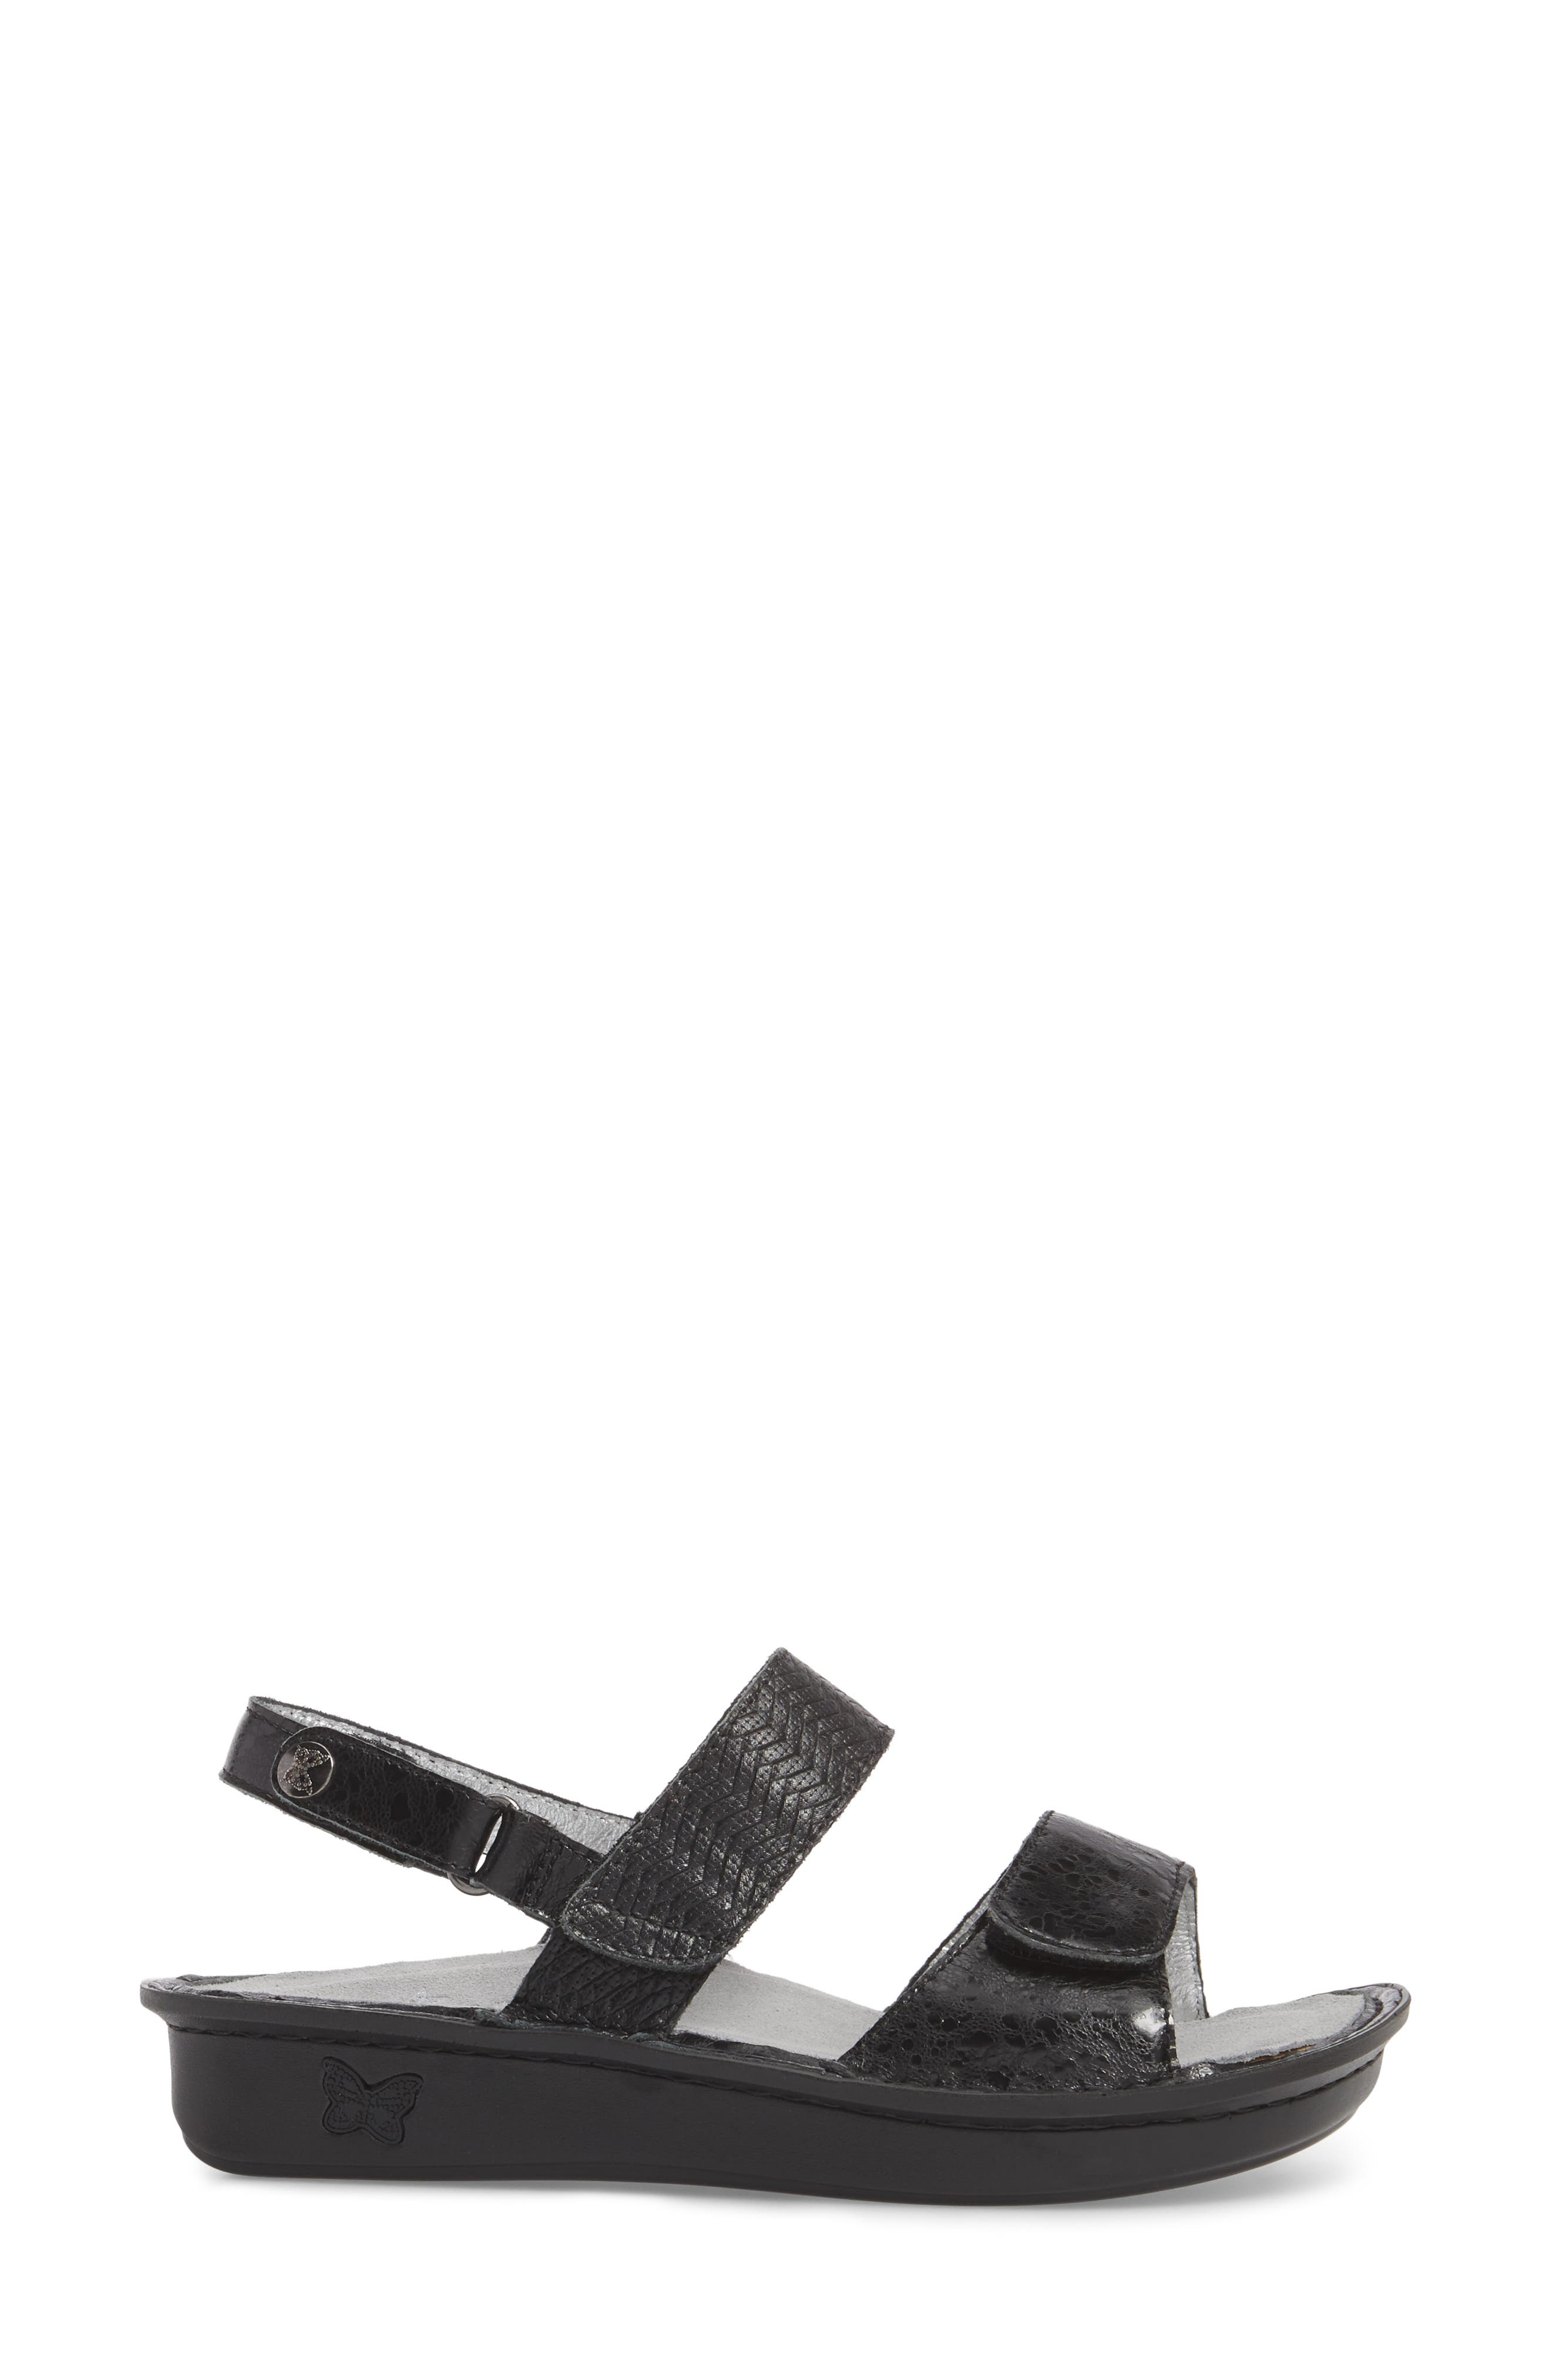 ALEGRIA, 'Verona' Sandal, Alternate thumbnail 3, color, BRAIDED BLACK LEATHER